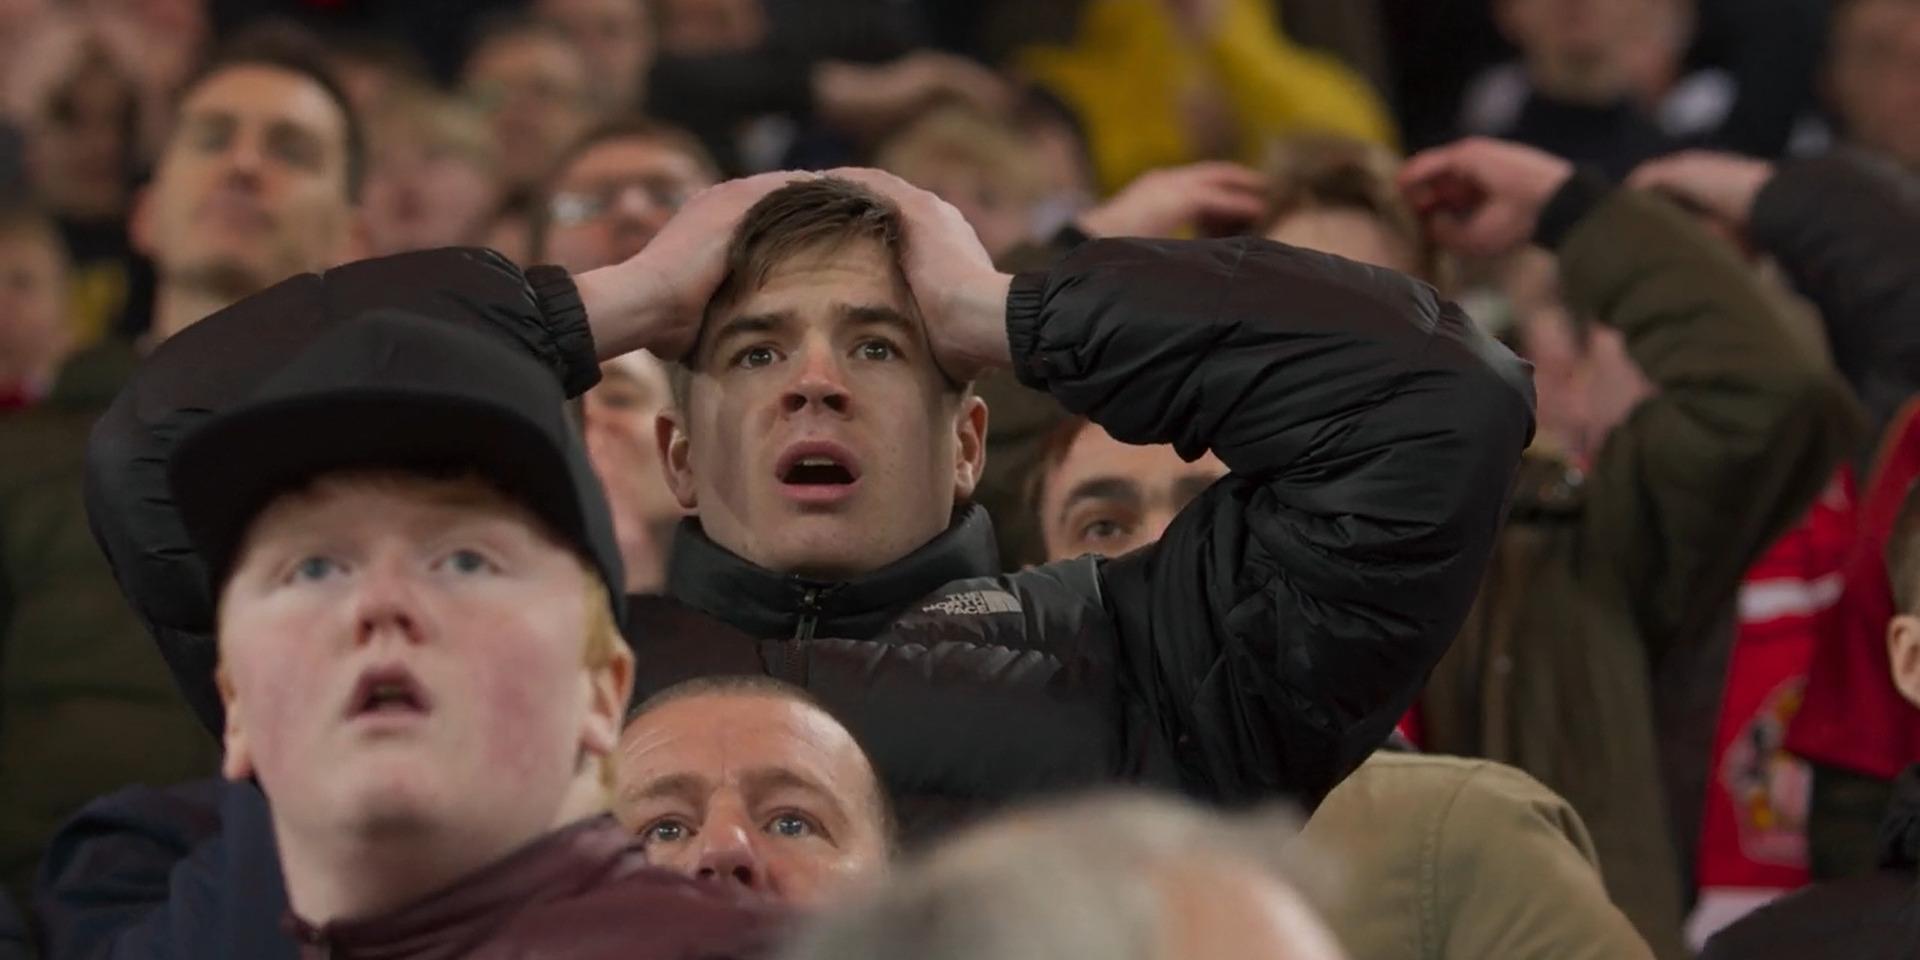 Sunderland 'Til I Die Temporada 3, Temporada 2